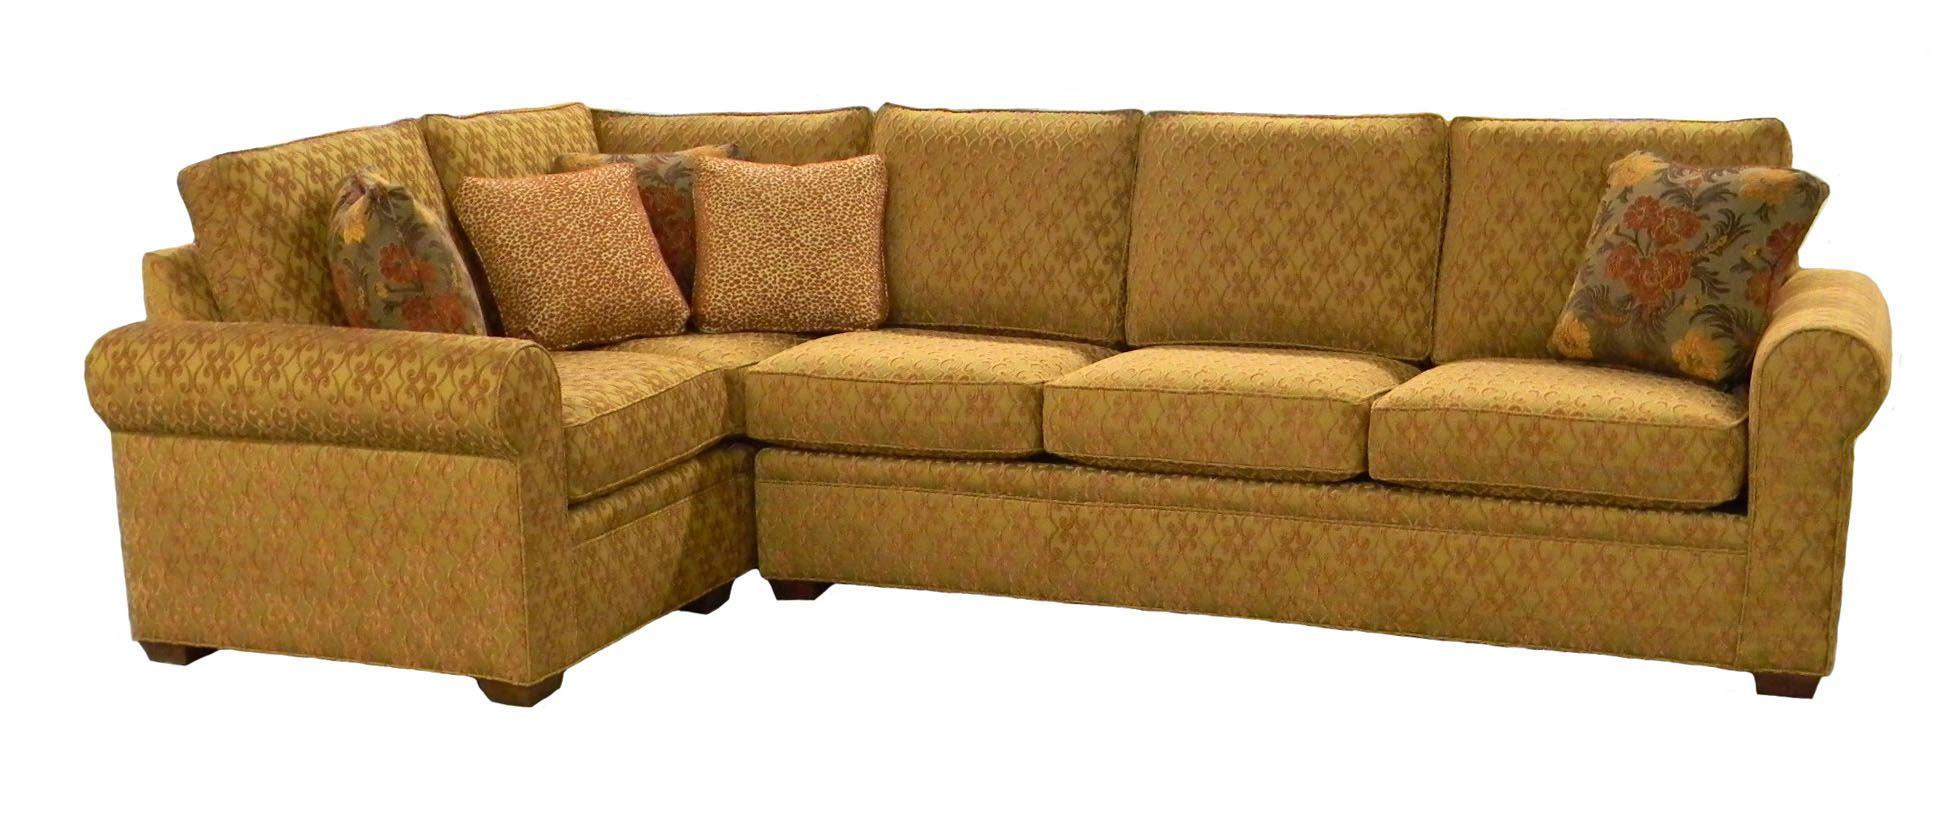 pin by homysofa on sofas couches sectional sofa sofa modern sofa rh pinterest ca